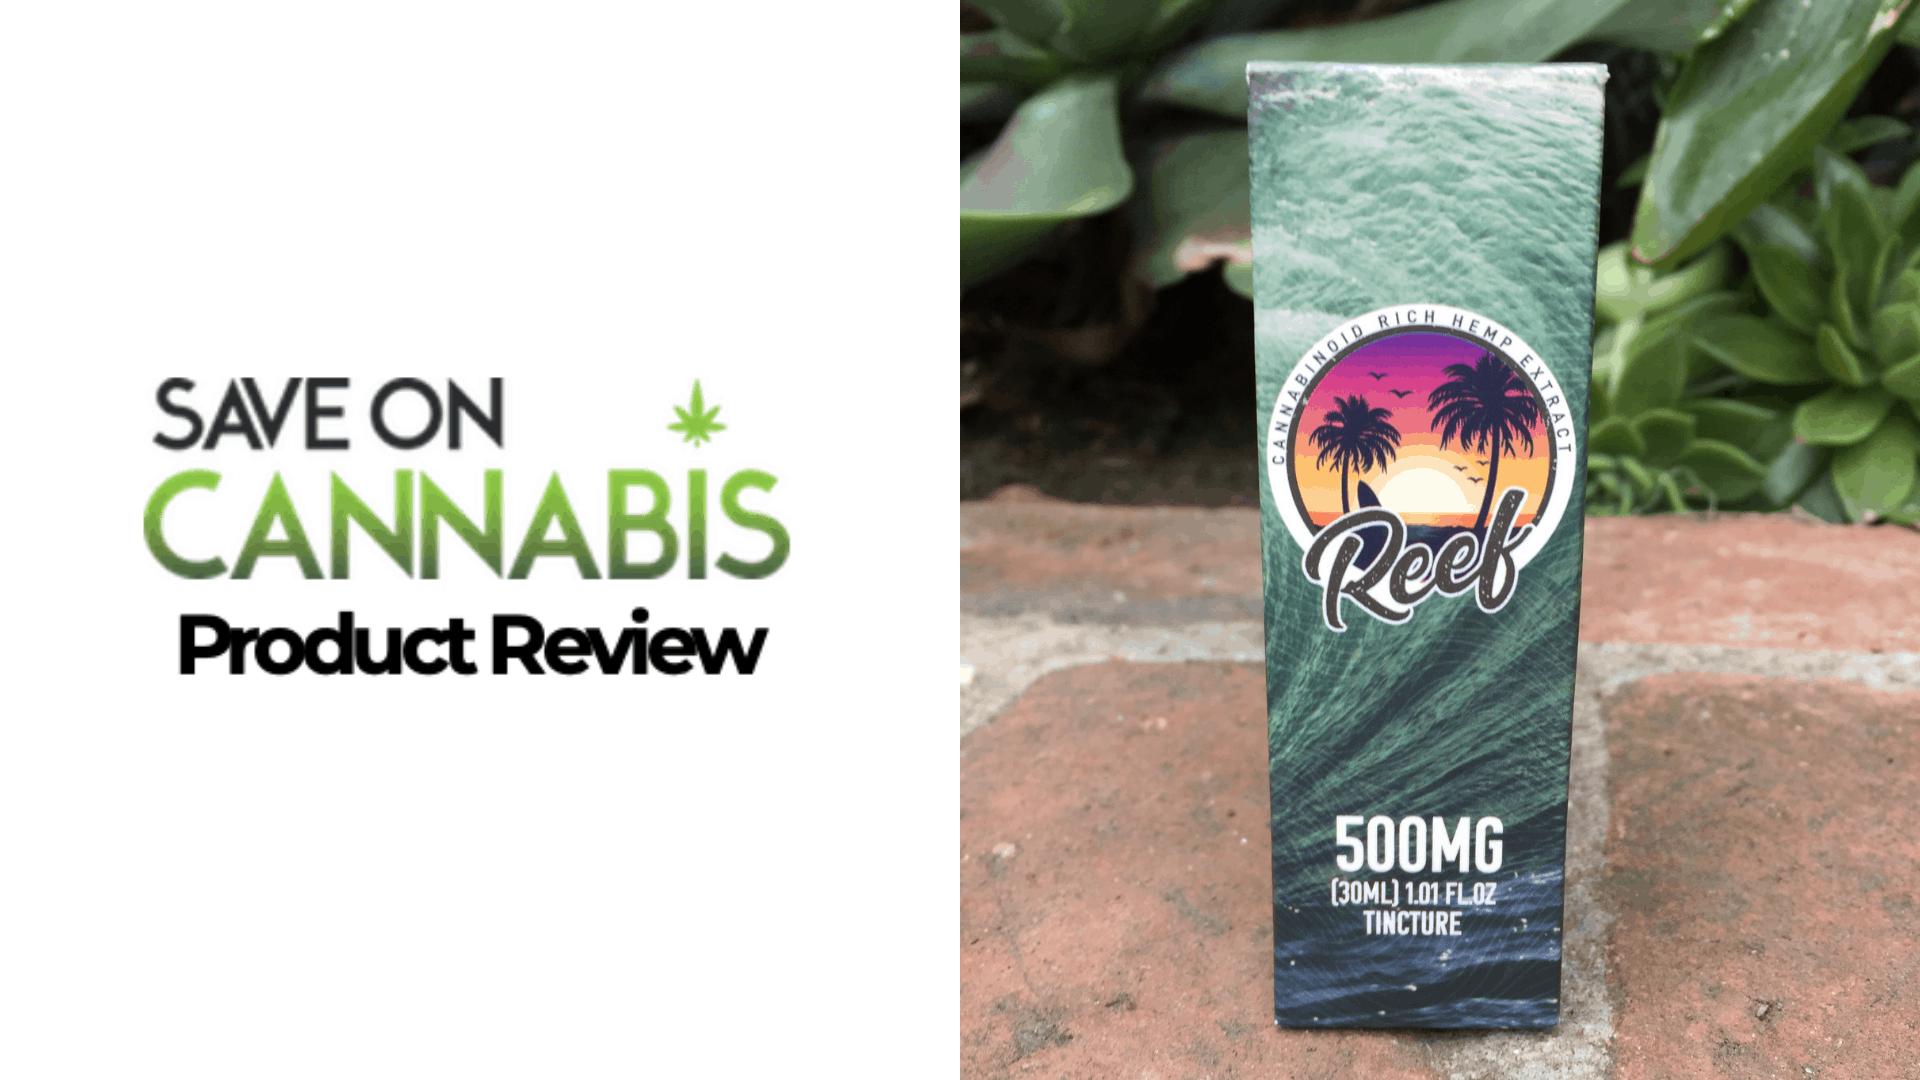 reef cbd newport beach orange citrus tincture 500 mg review save on cannabis website